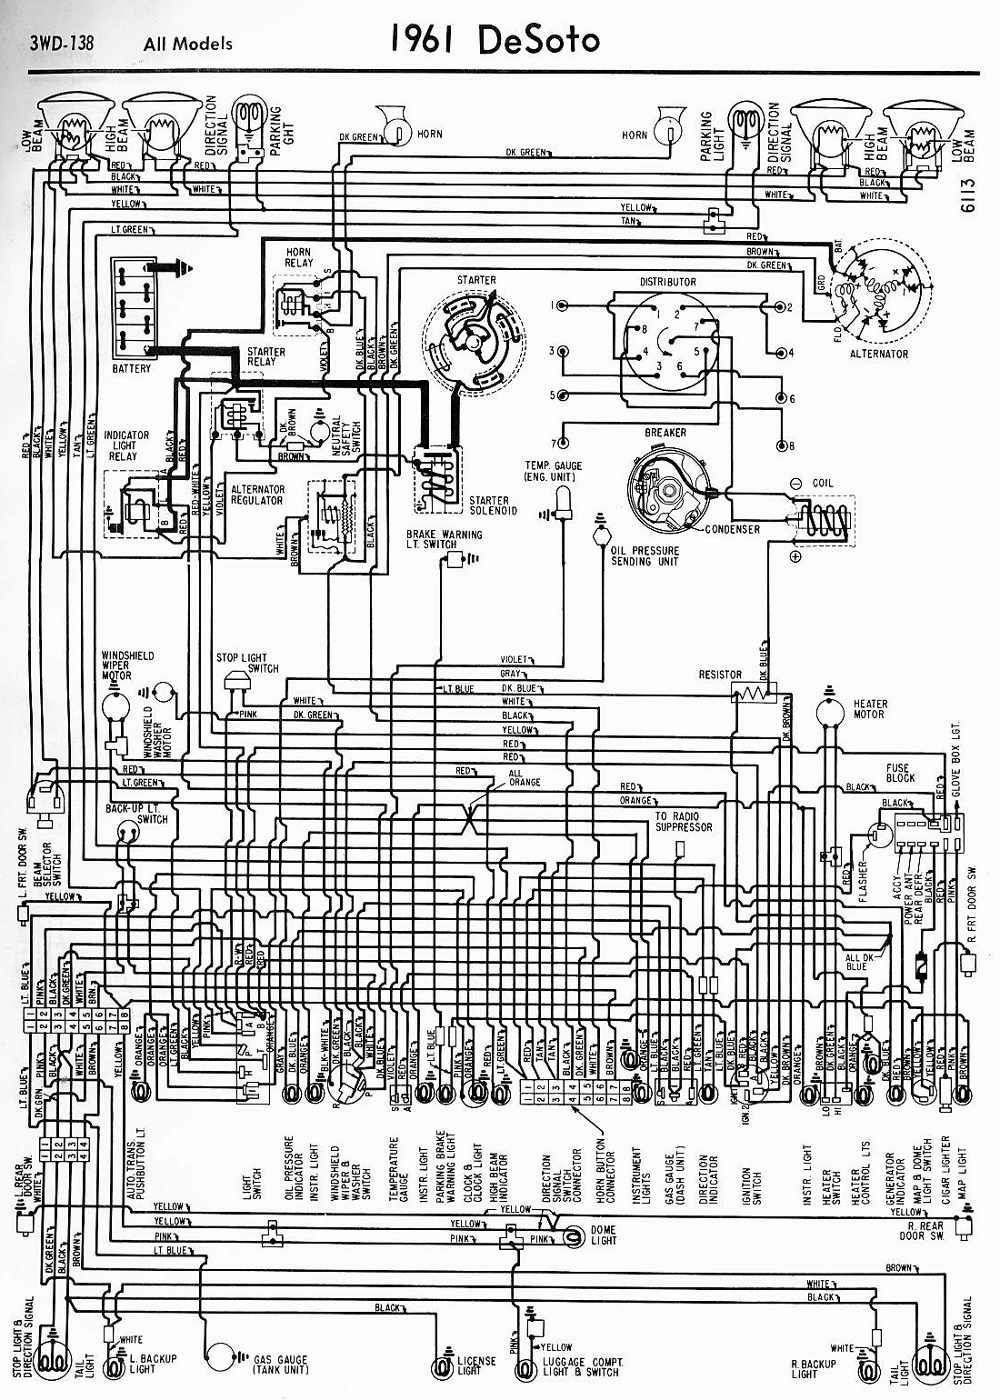 wiring diagrams of 1961 desoto all models?t=1508403749 de soto car manuals, wiring diagrams pdf & fault codes 1941 desoto wiring diagram at reclaimingppi.co